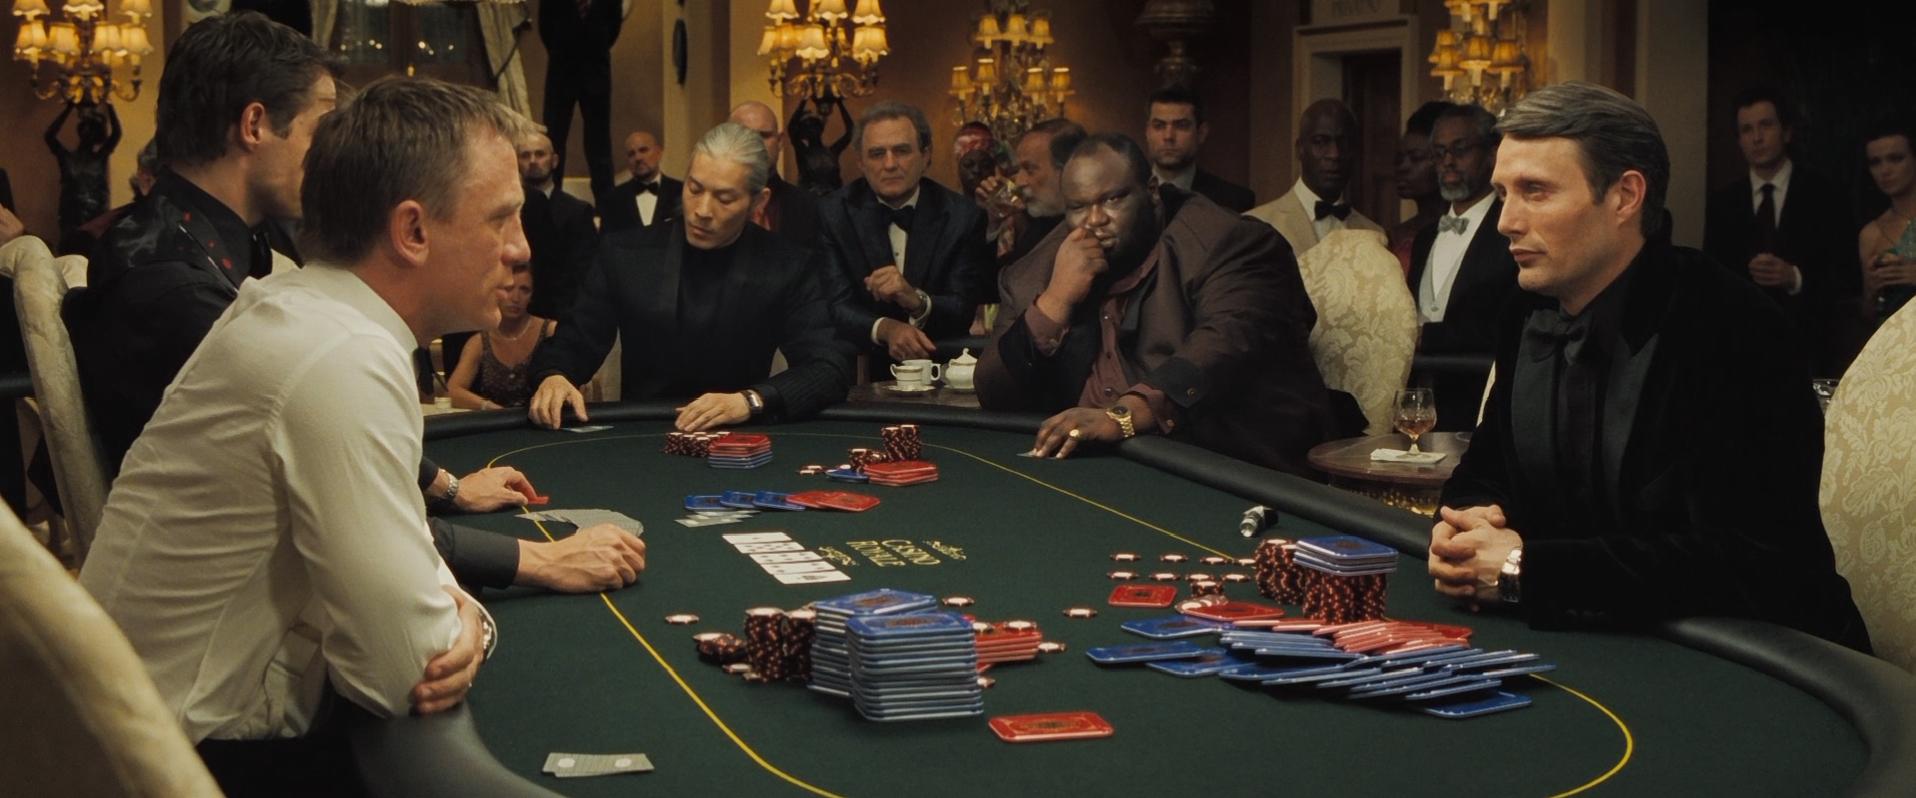 Bond casino royale card game morongo casino resort concert schedule